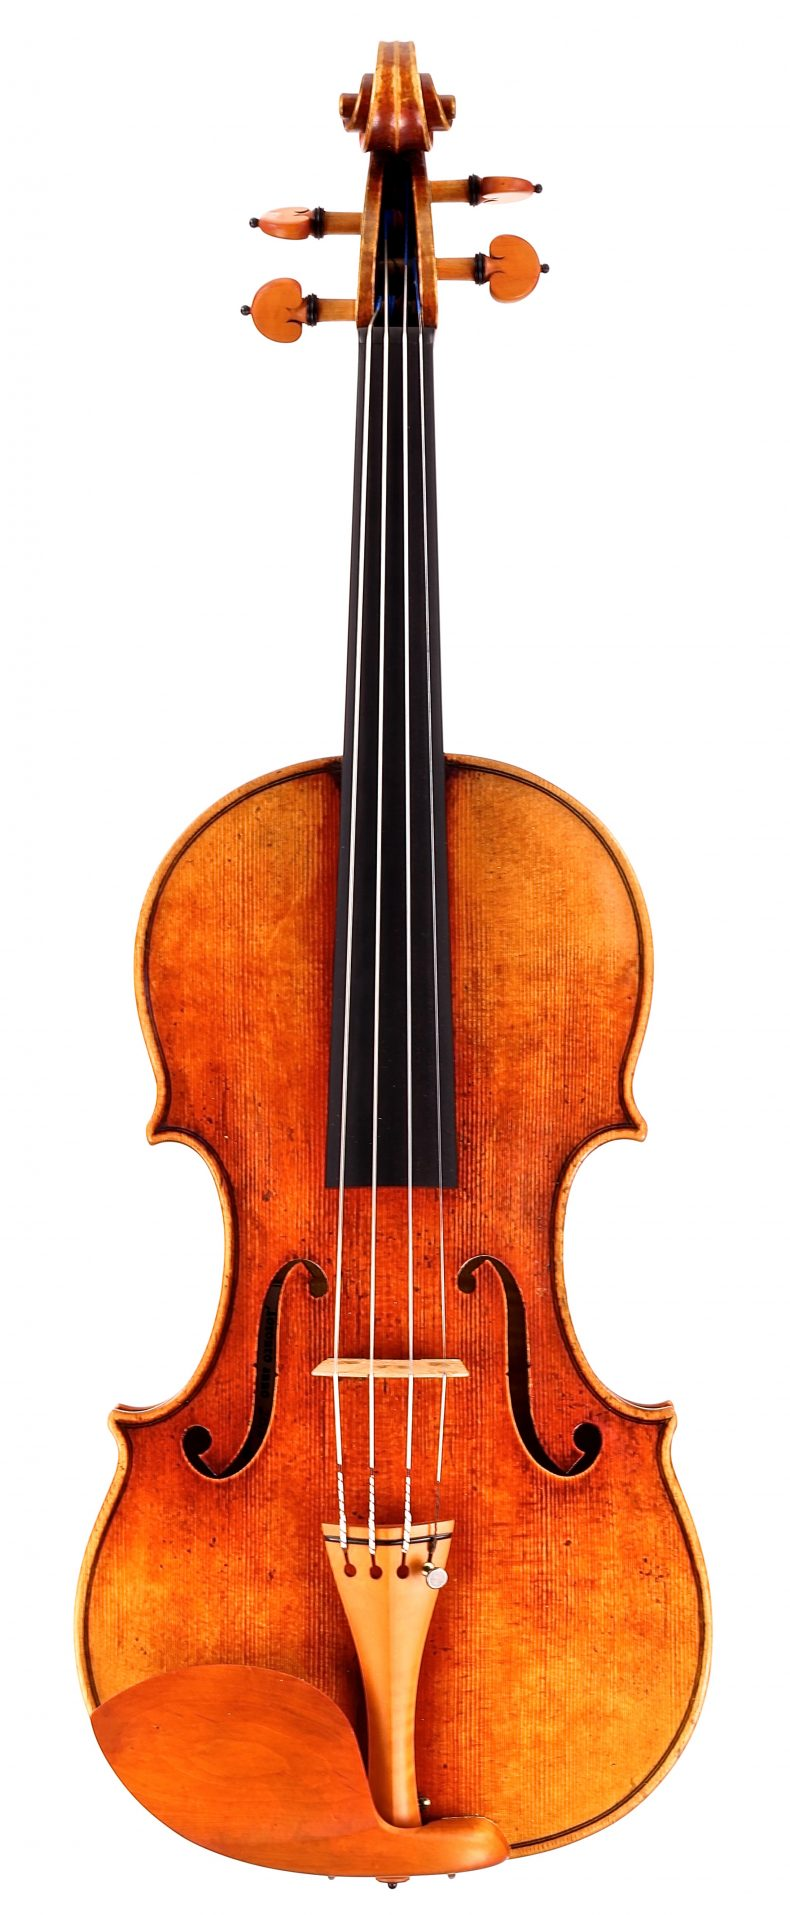 sq-violin-front